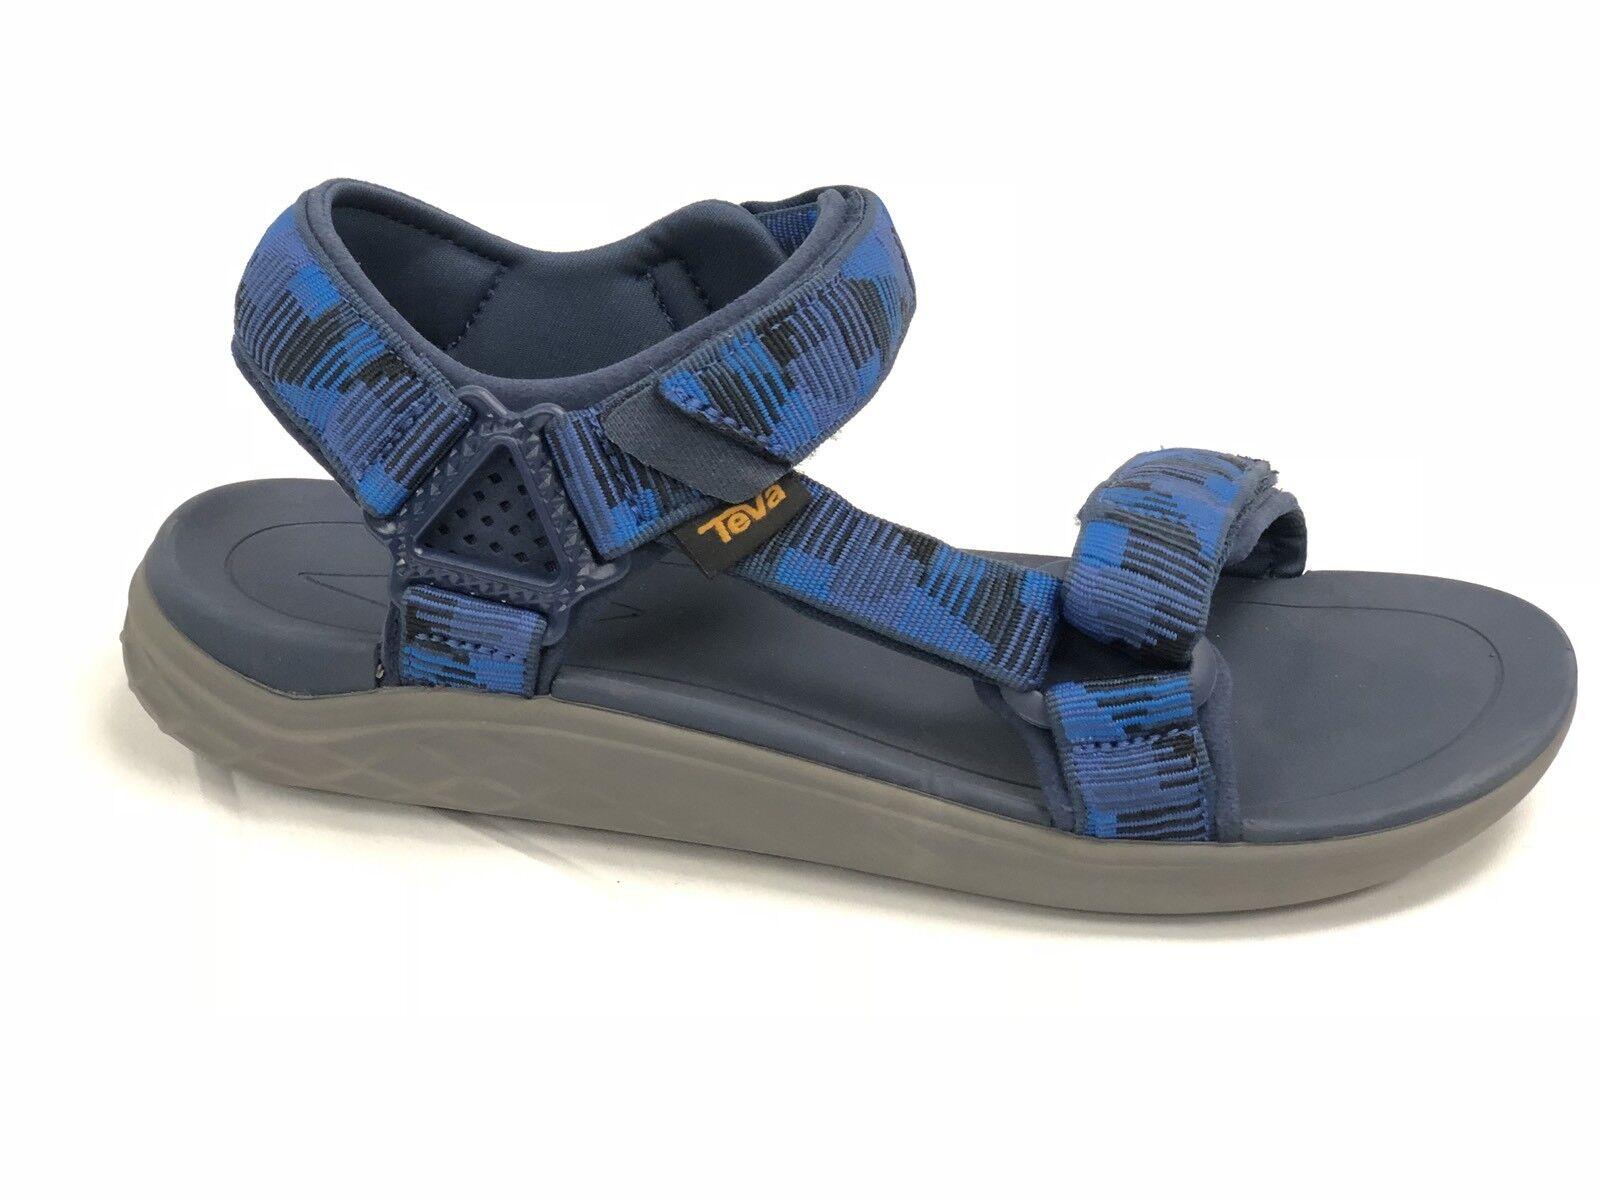 Teva Terra Float 2 Universal Nica GALAXY blueE MEN'S 1091349 Strap Sandal NEW